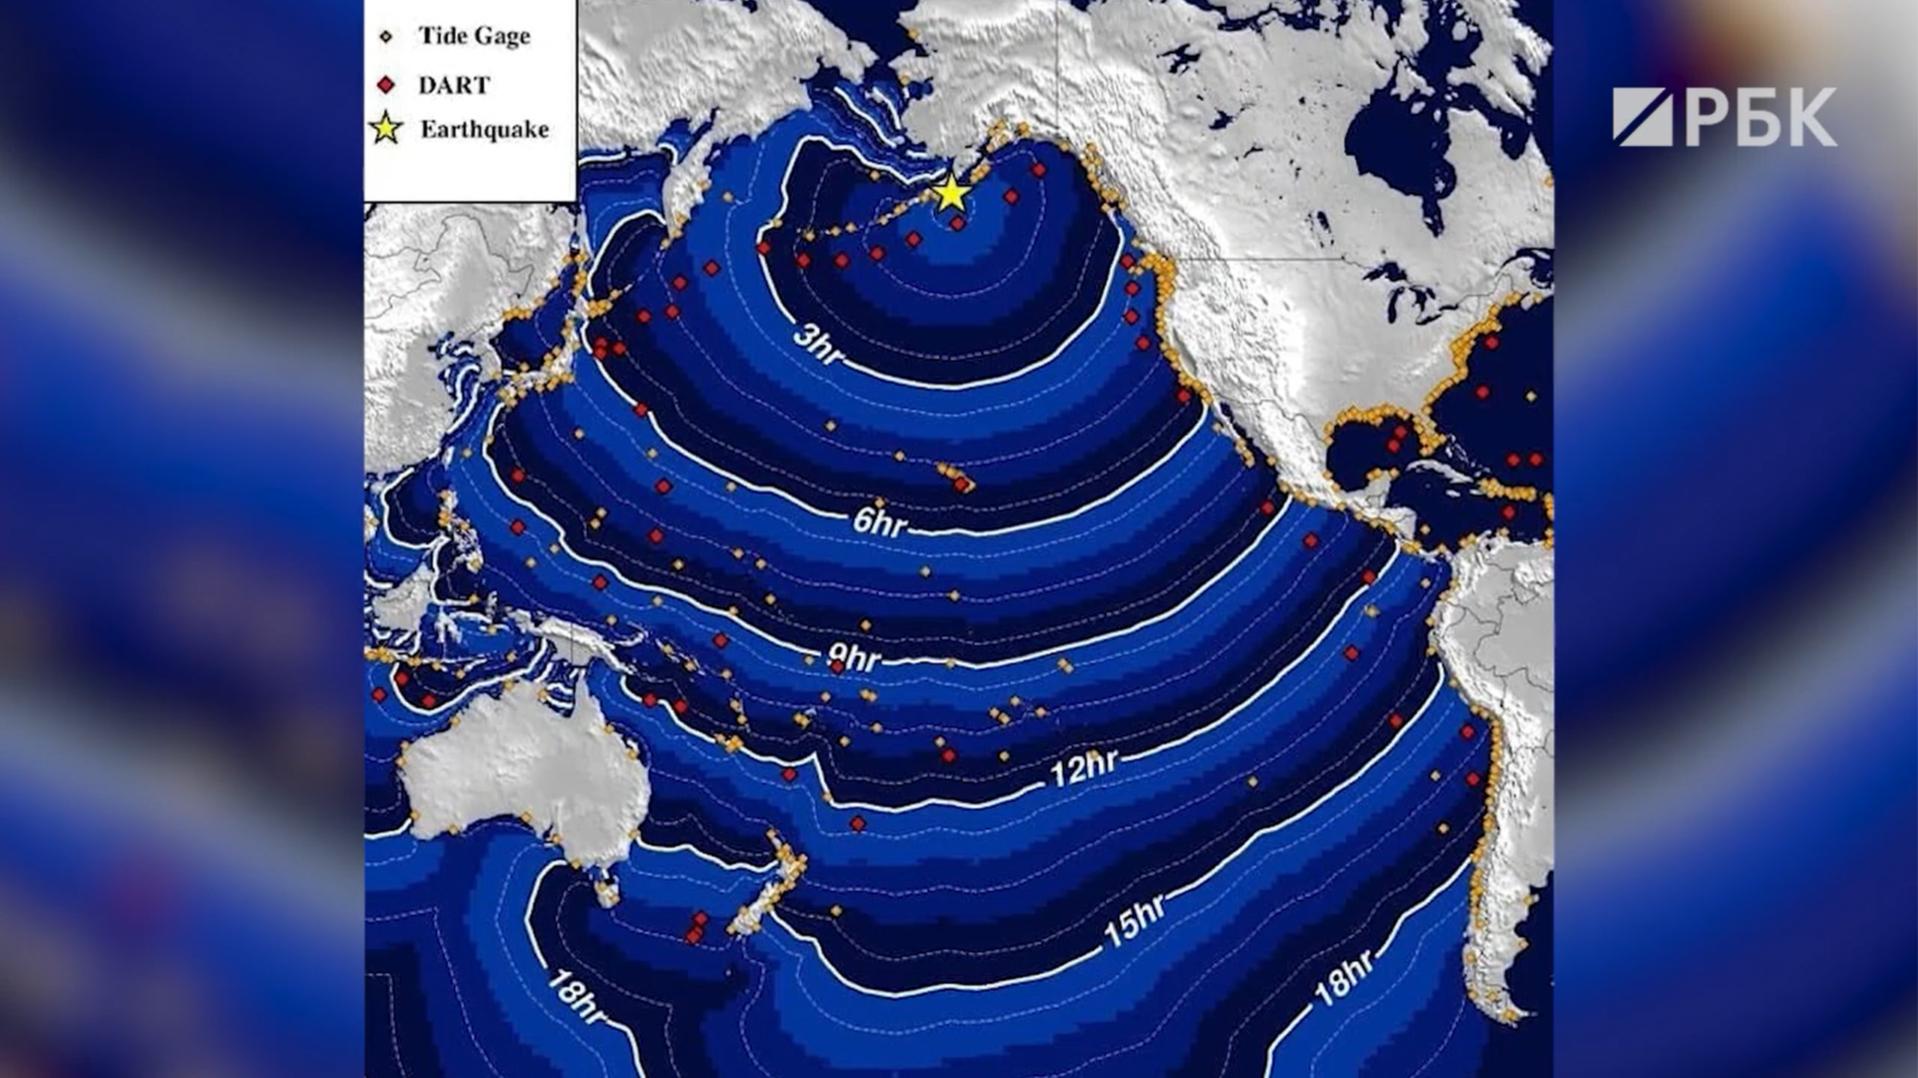 В МЧС исключили цунами у берегов Камчатки после землетрясения на Аляске :: Общество :: РБК